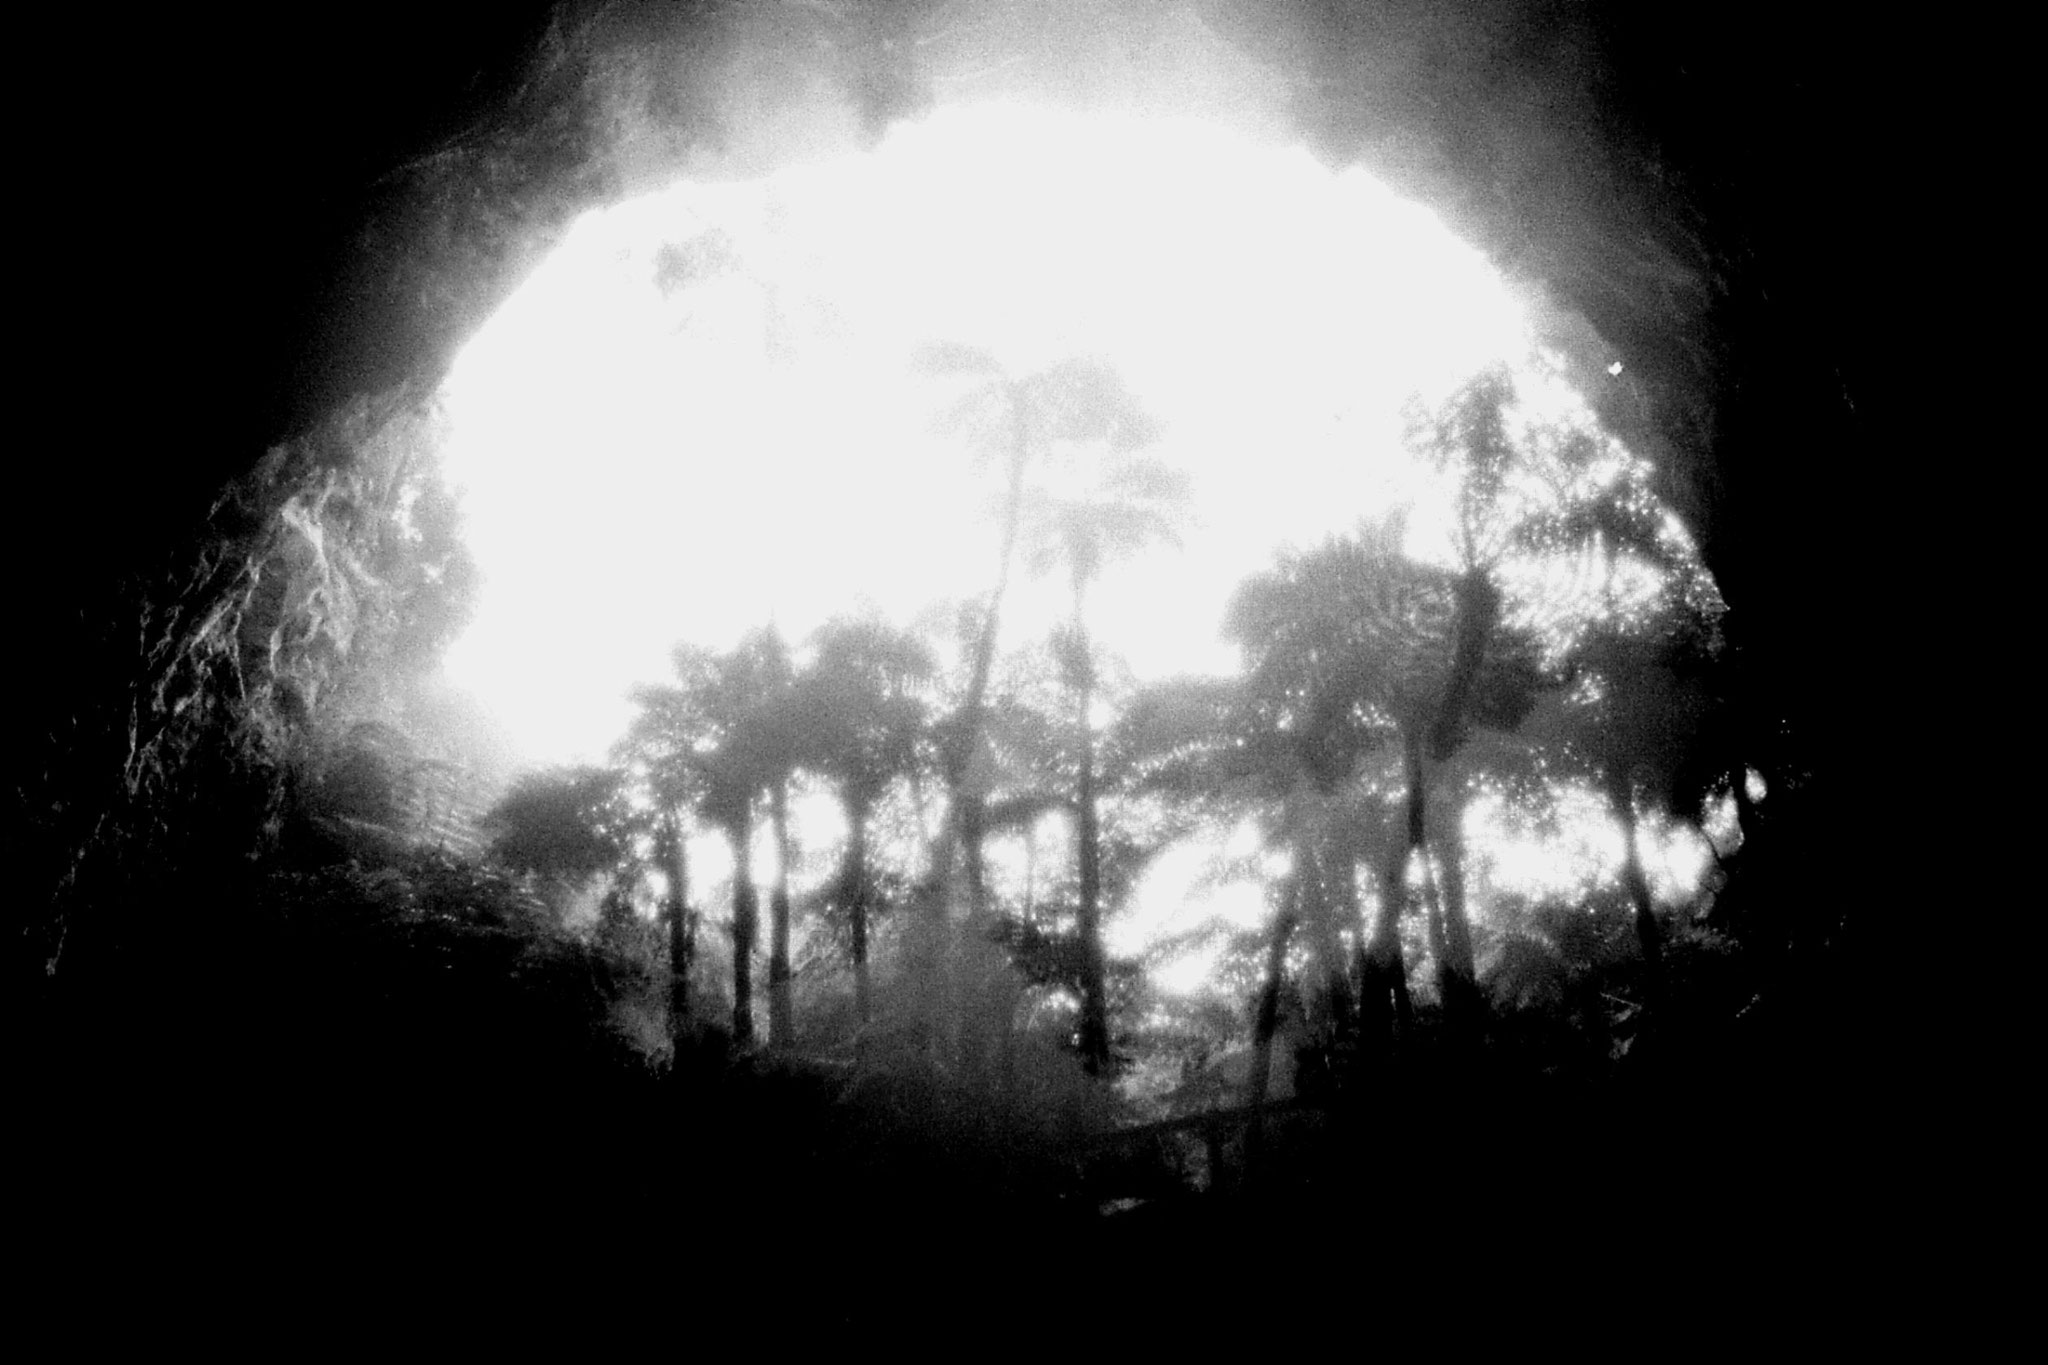 31/8/1990: 8: Orakeikorako opening of Ruatapu Cave